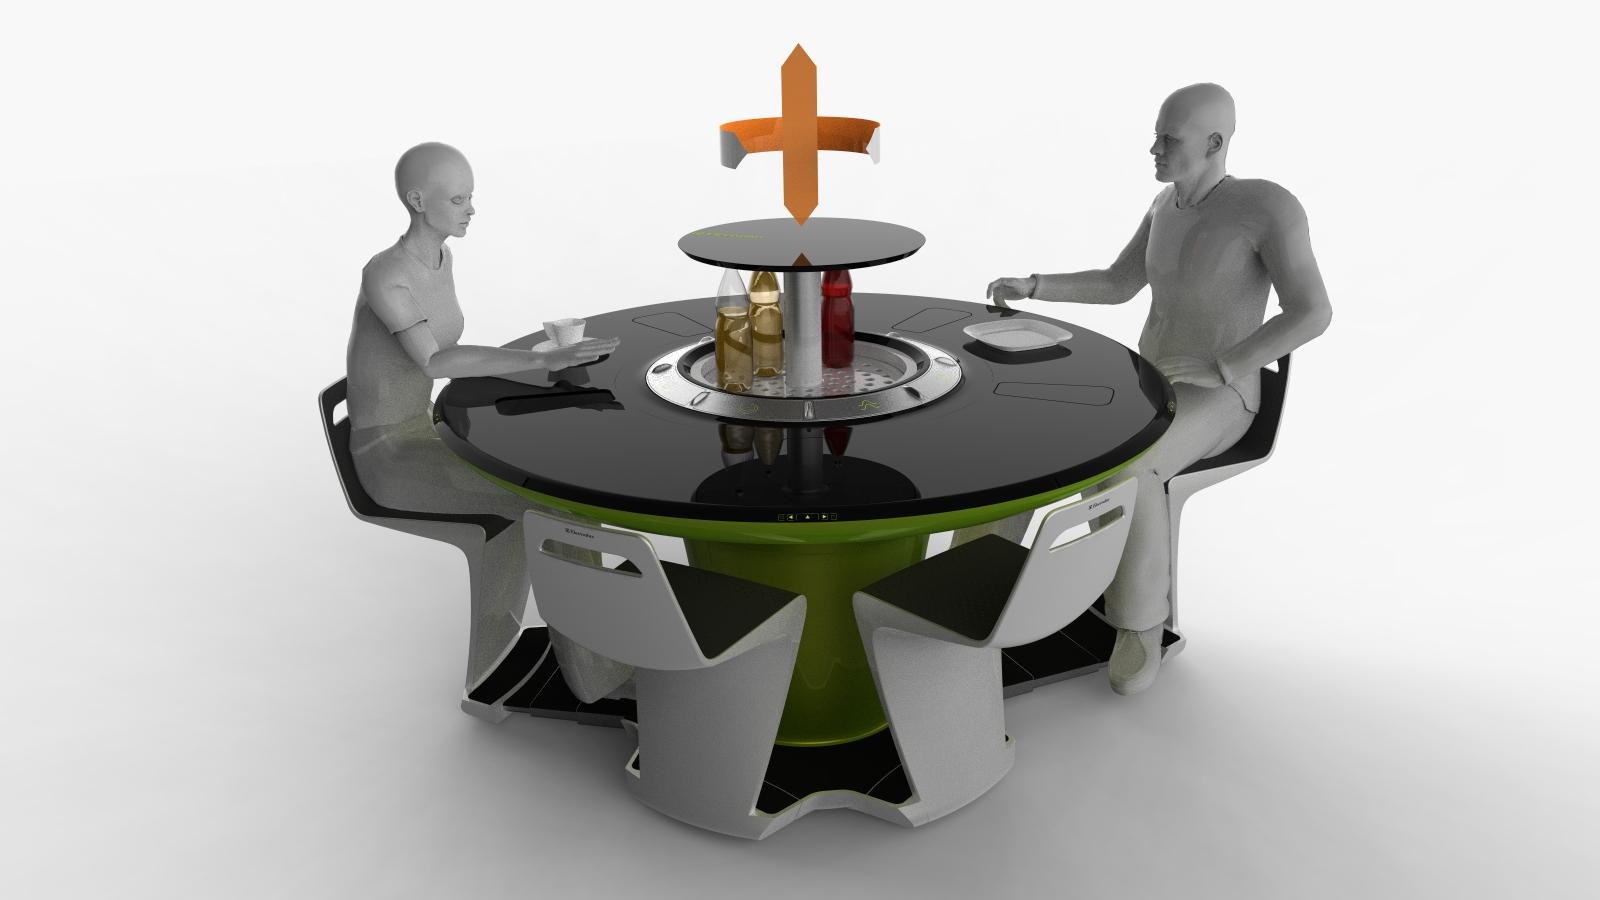 Future Dining Table By Petr Kub 237 K At Coroflot Com